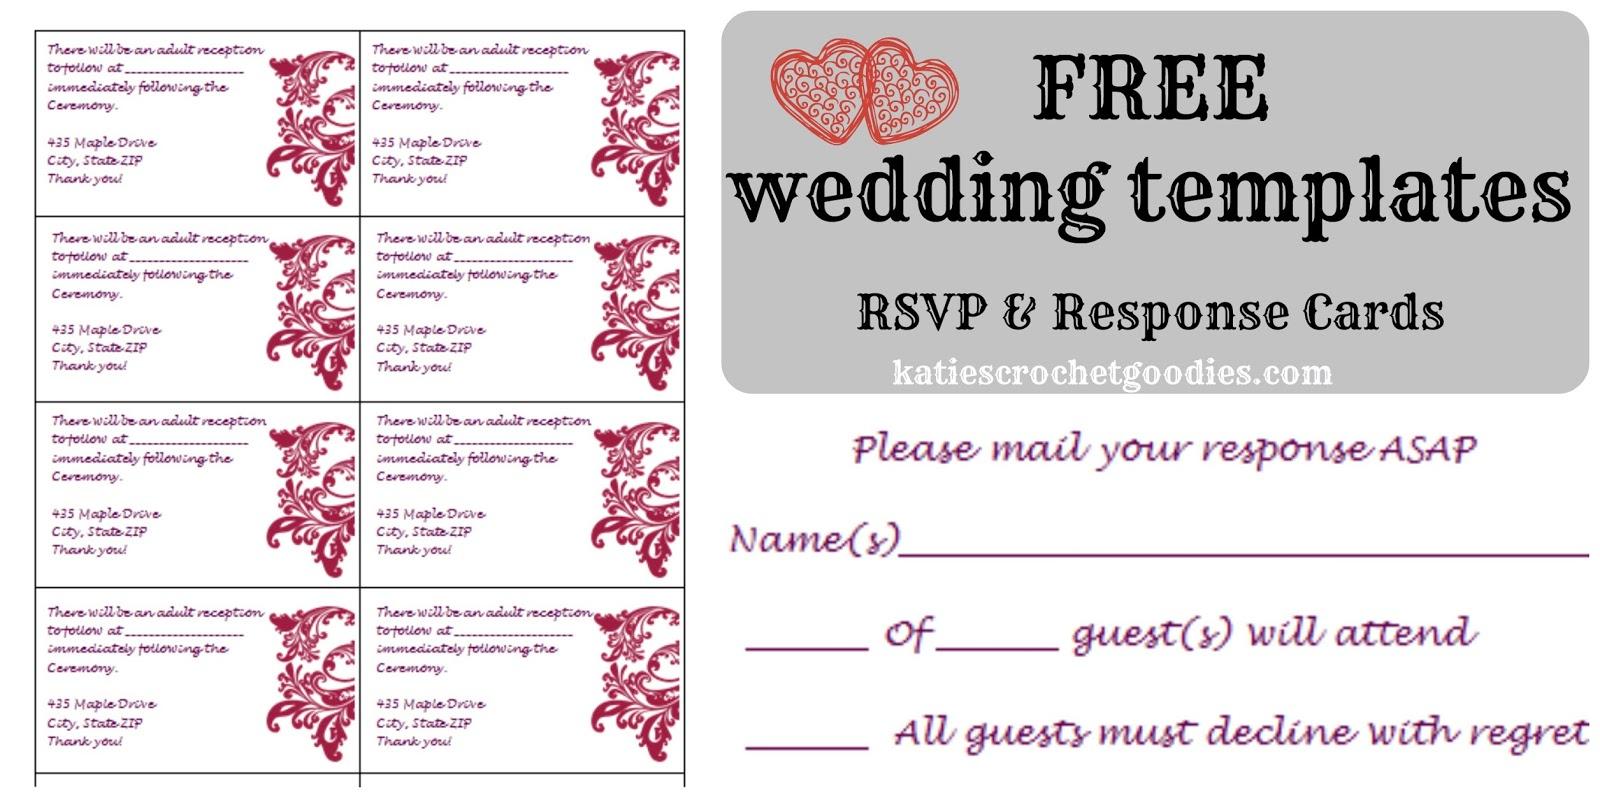 Free Wedding Templates Rsvp Amp Reception Cards